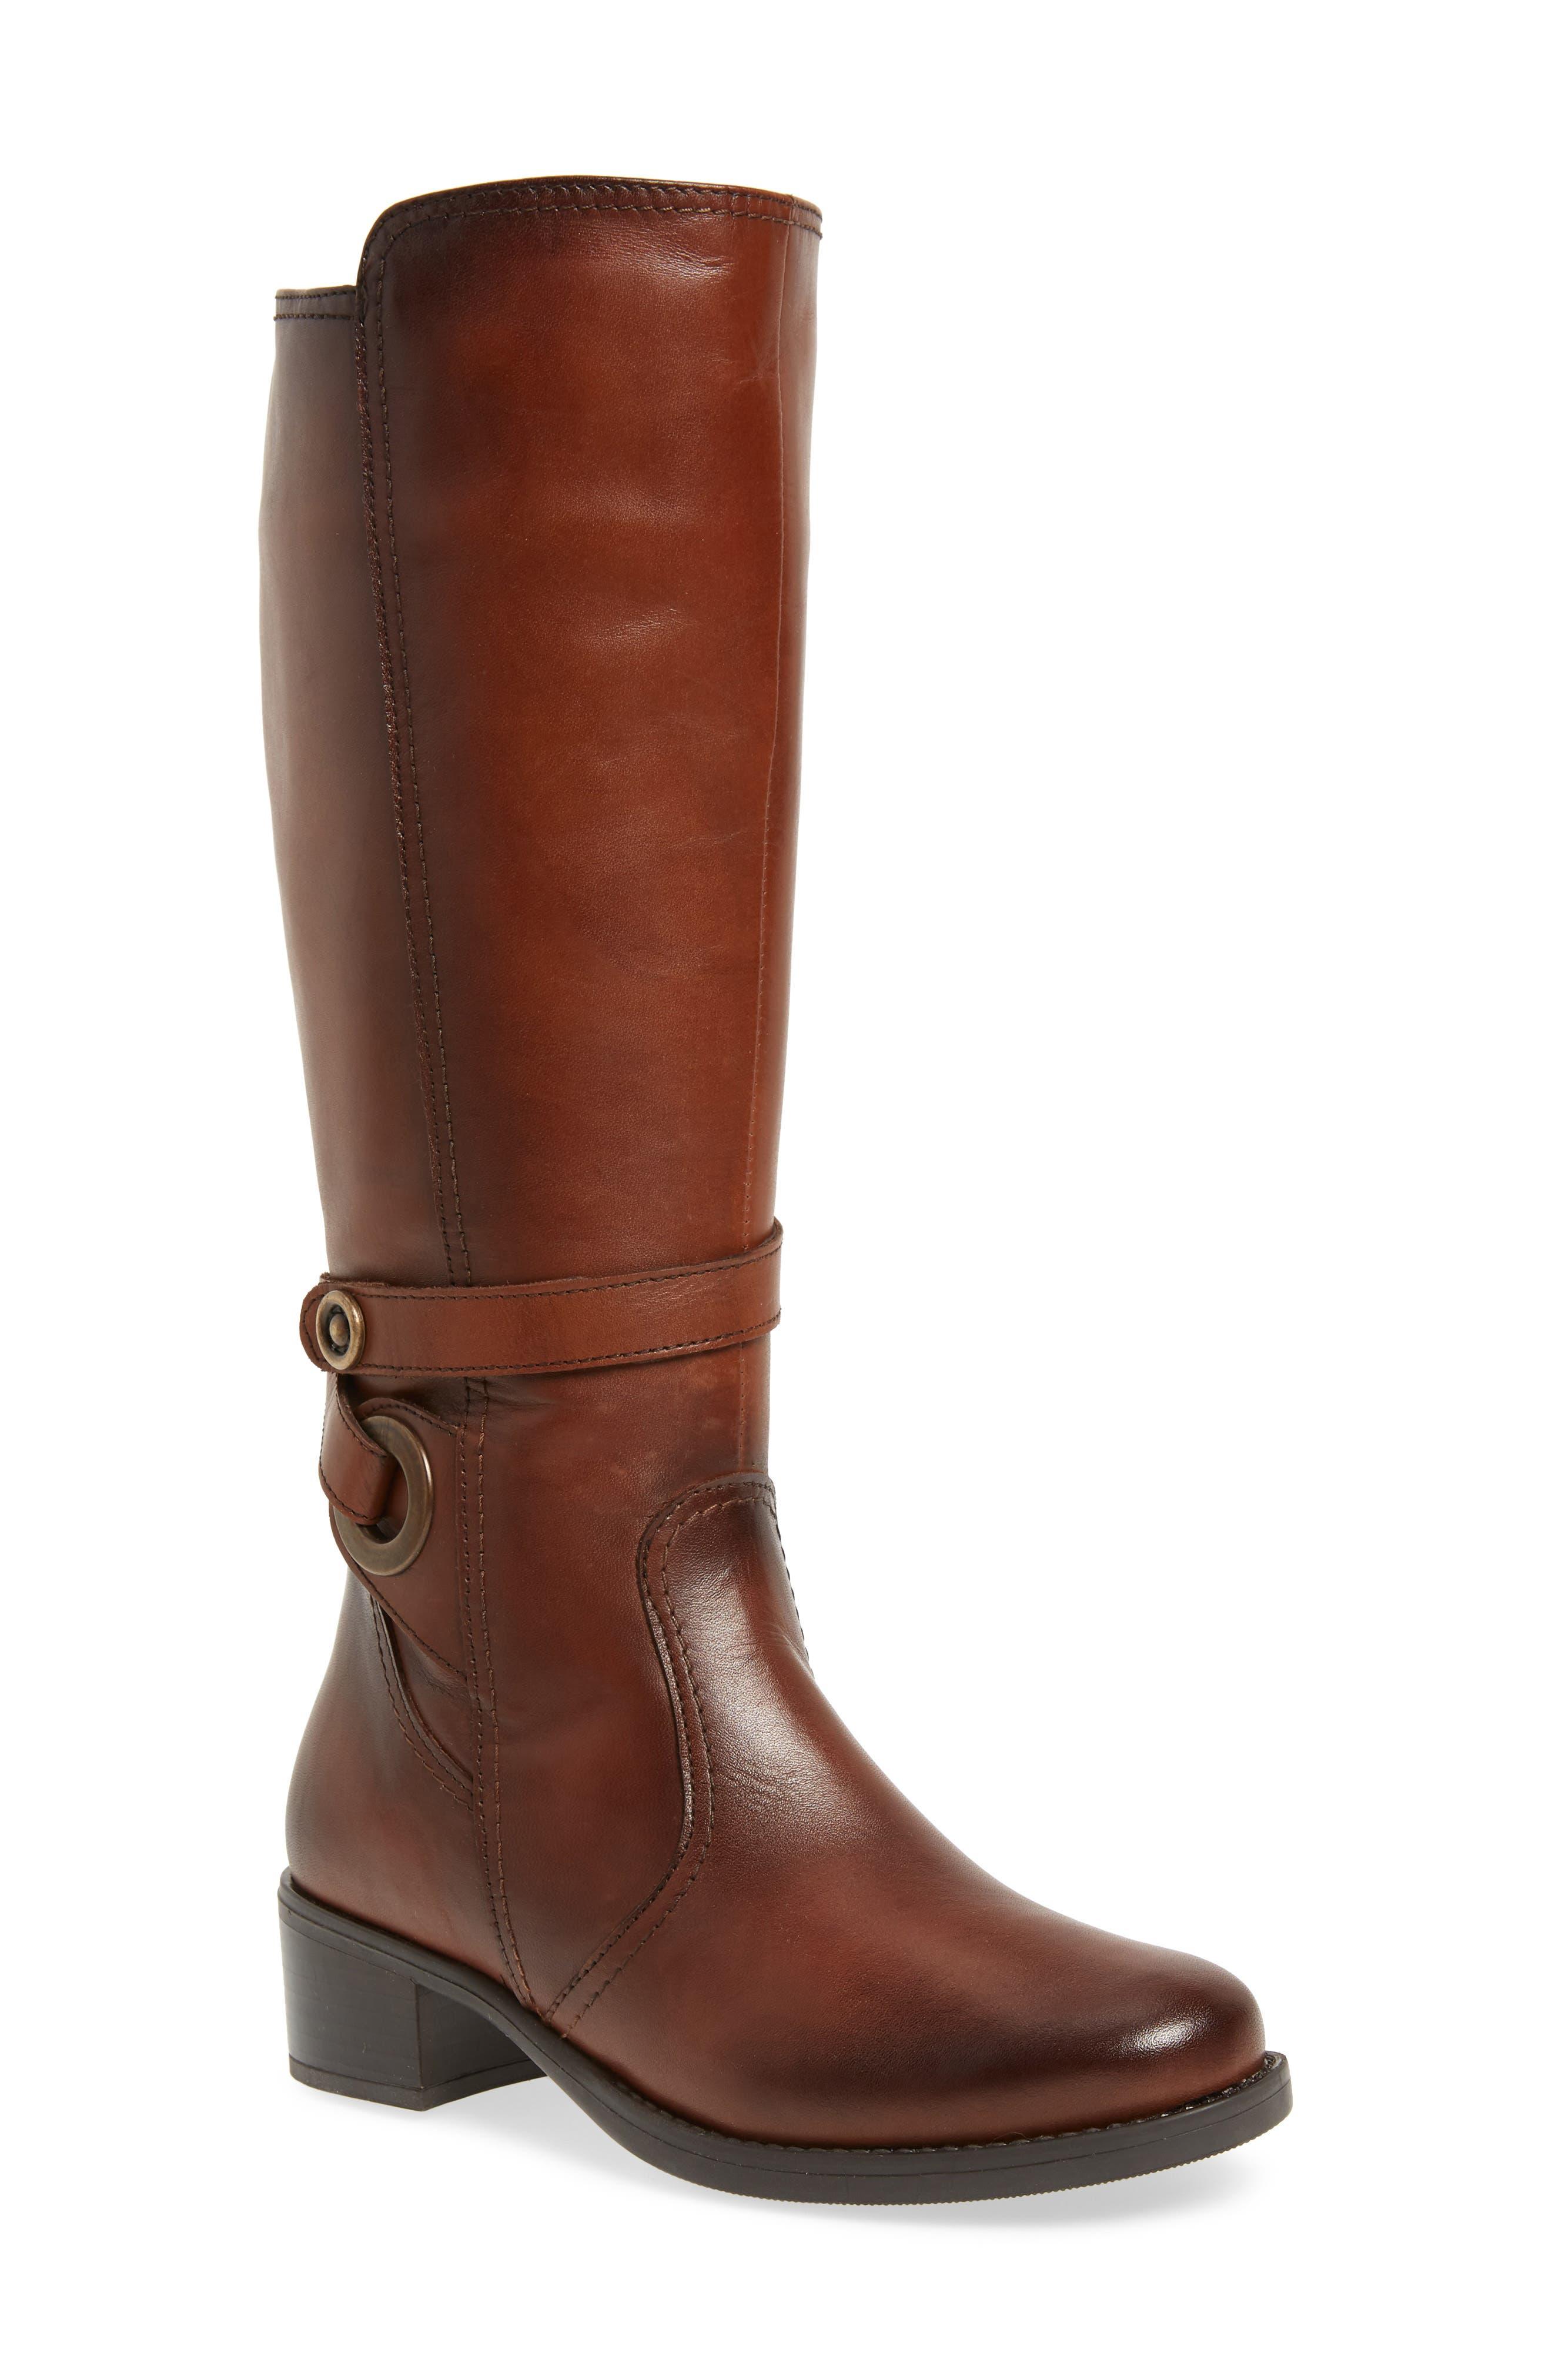 David Tate Portofino Boot, Brown